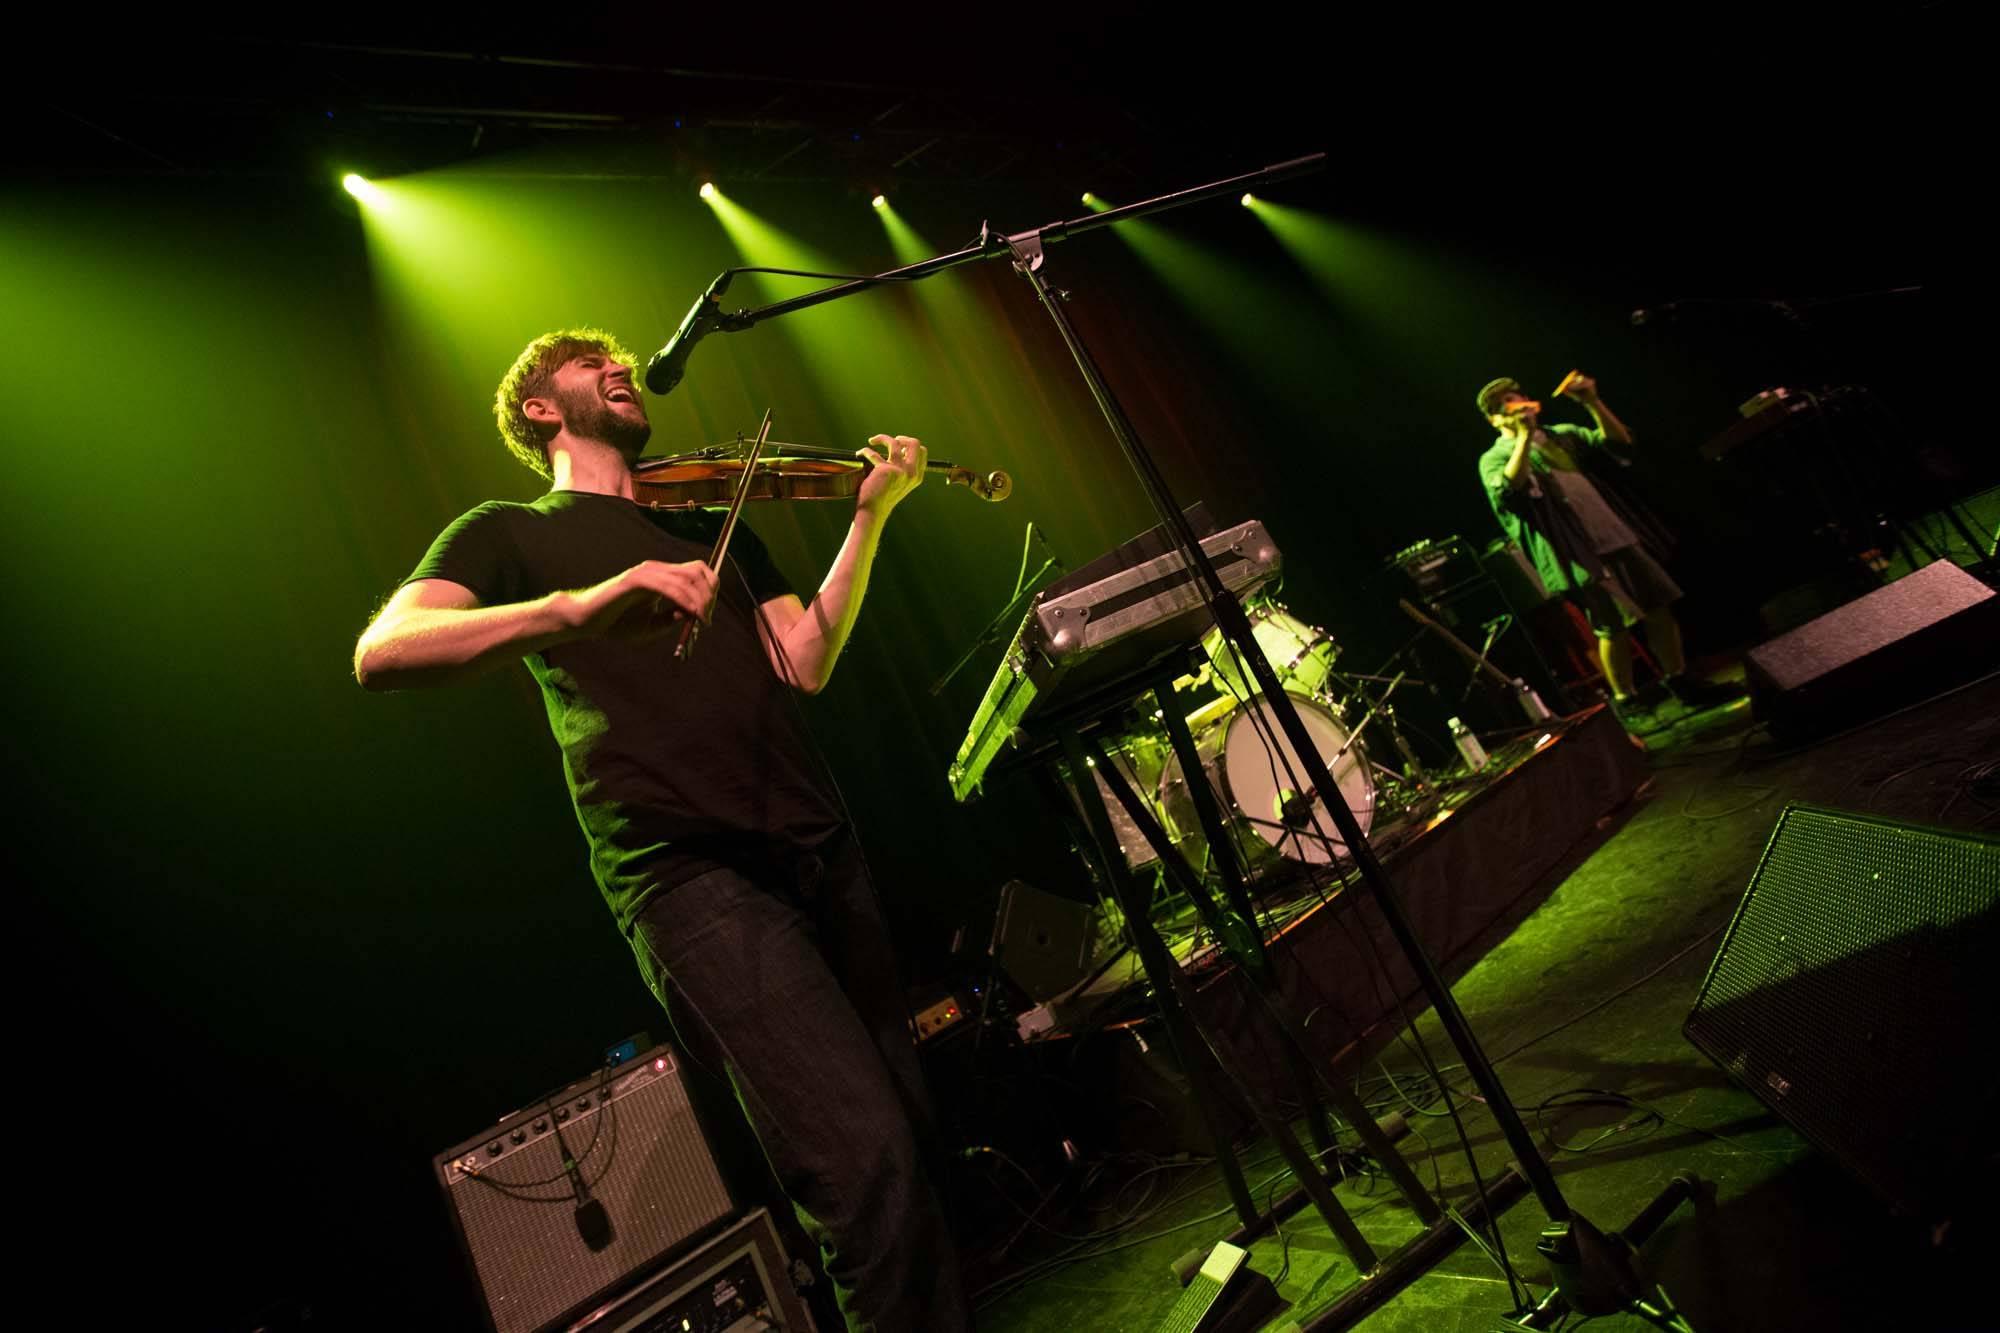 Owen Pallett at the Imperial Theatre, Vancouver, Sept. 9 2014. Kirk Chantraine photo.